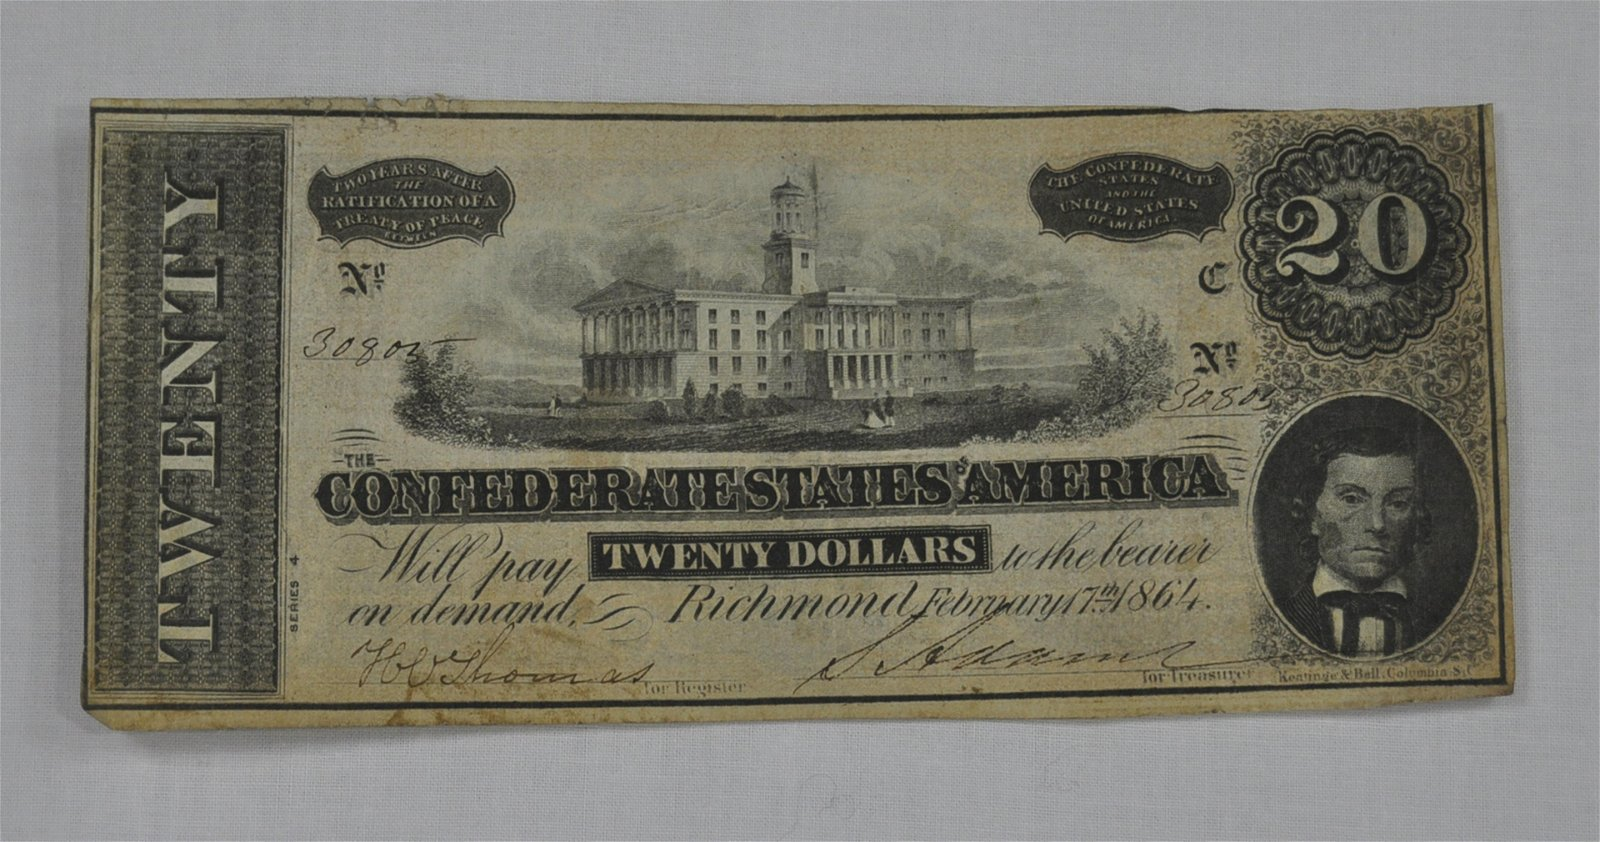 C.S.A. 1864 Twenty Dollar Note